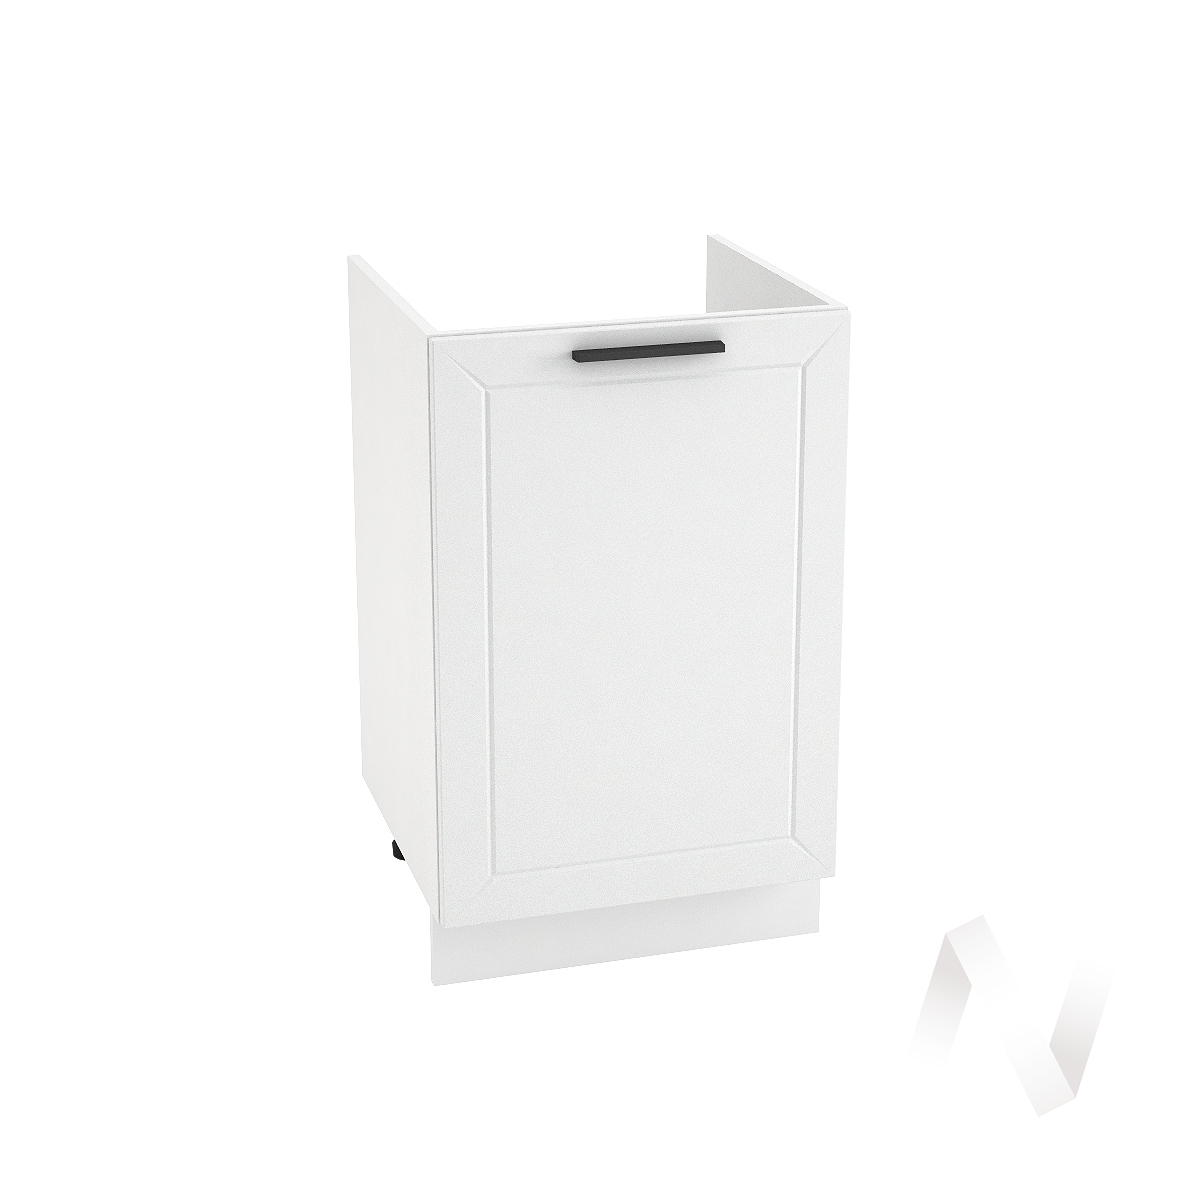 "Кухня ""Глетчер"": Шкаф нижний под мойку 500, ШНМ 500 (Айленд Силк/корпус белый)"